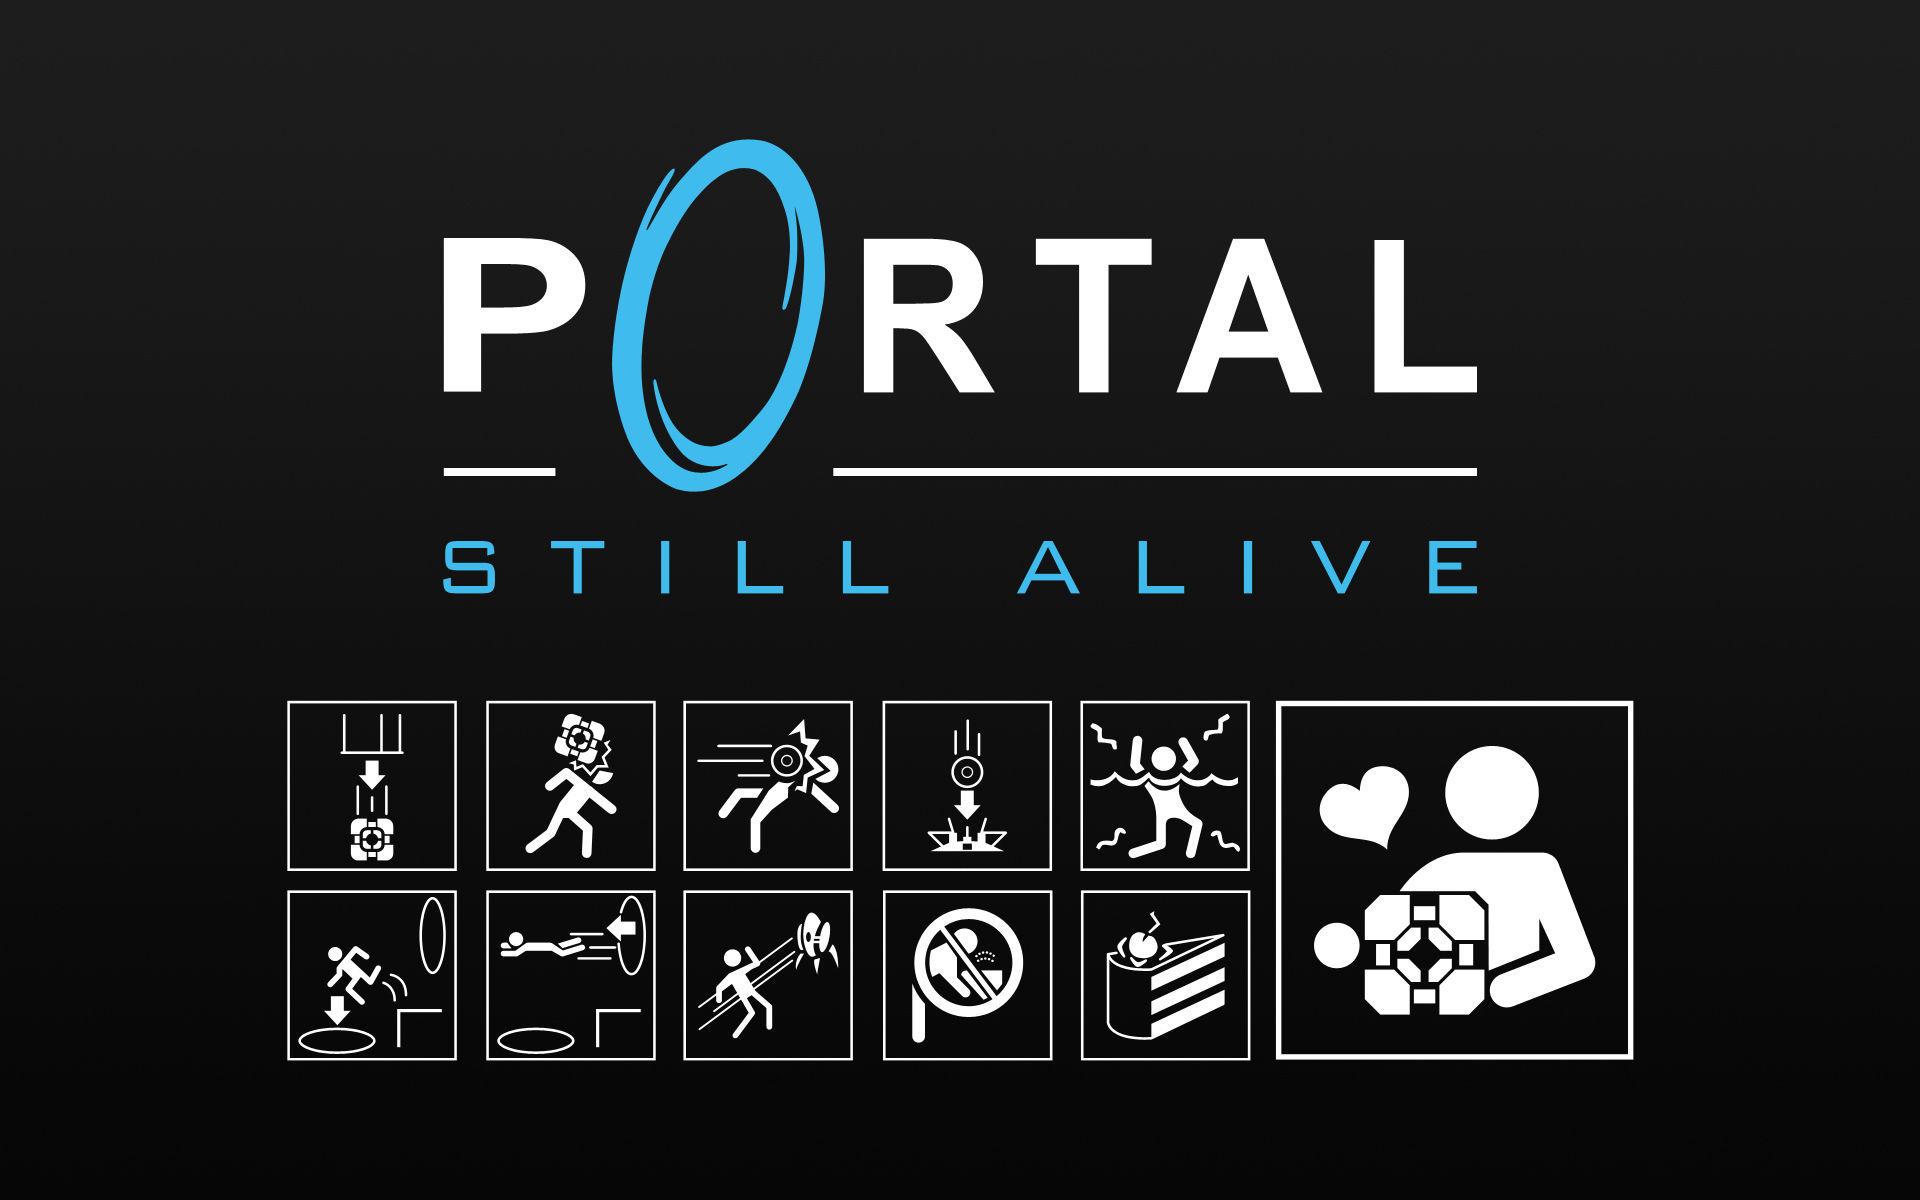 Image 71506 Still Alive Portal End Theme Know